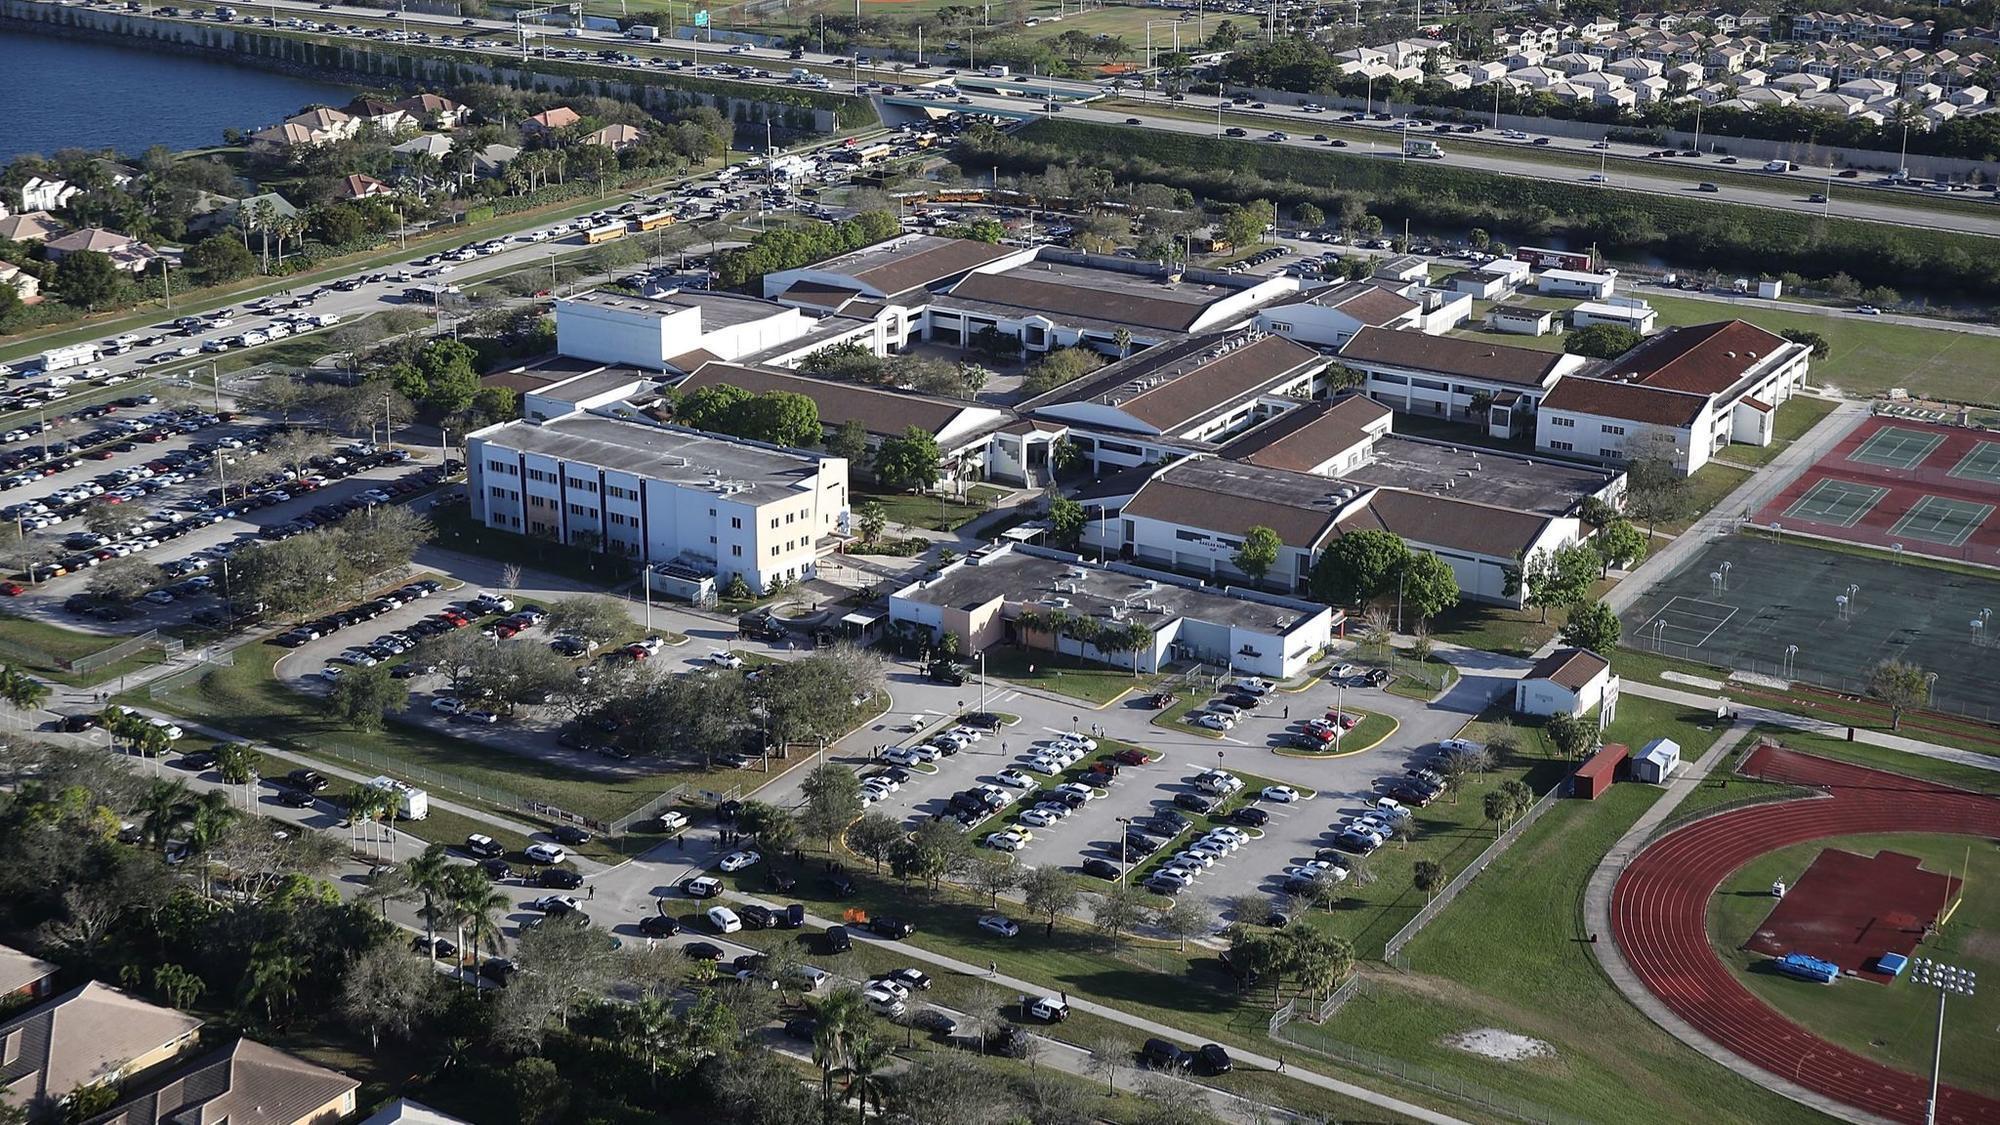 Parkland Campus Map.Marjory Stoneman Douglas High School In Parkland Facts About The